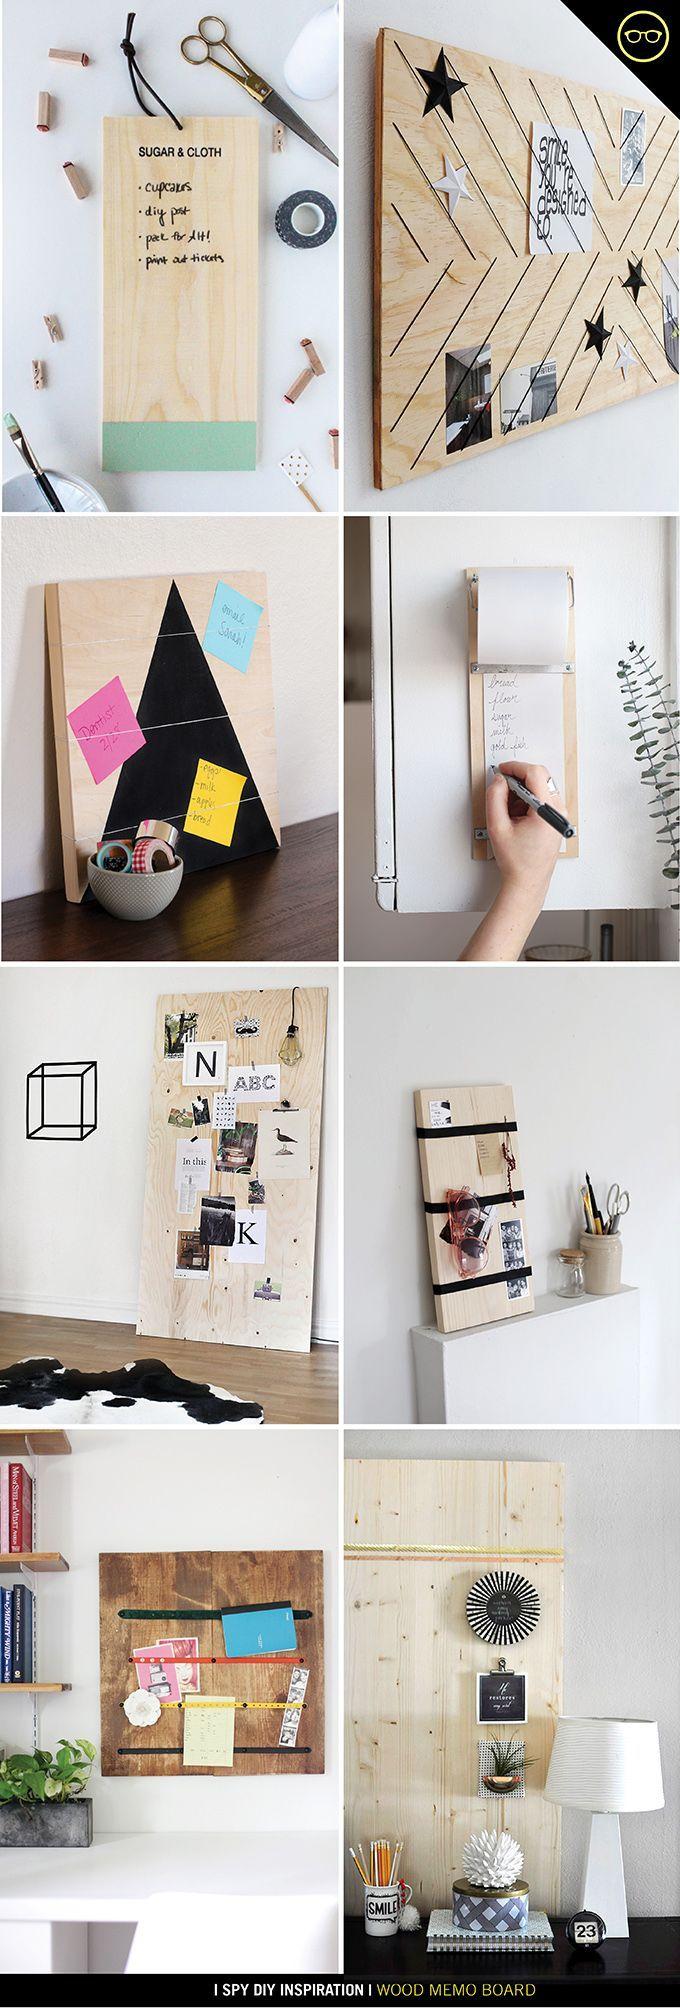 DIY INSPIRATION | WOOD MEMO BOARD | I Spy DIY | Bloglovin